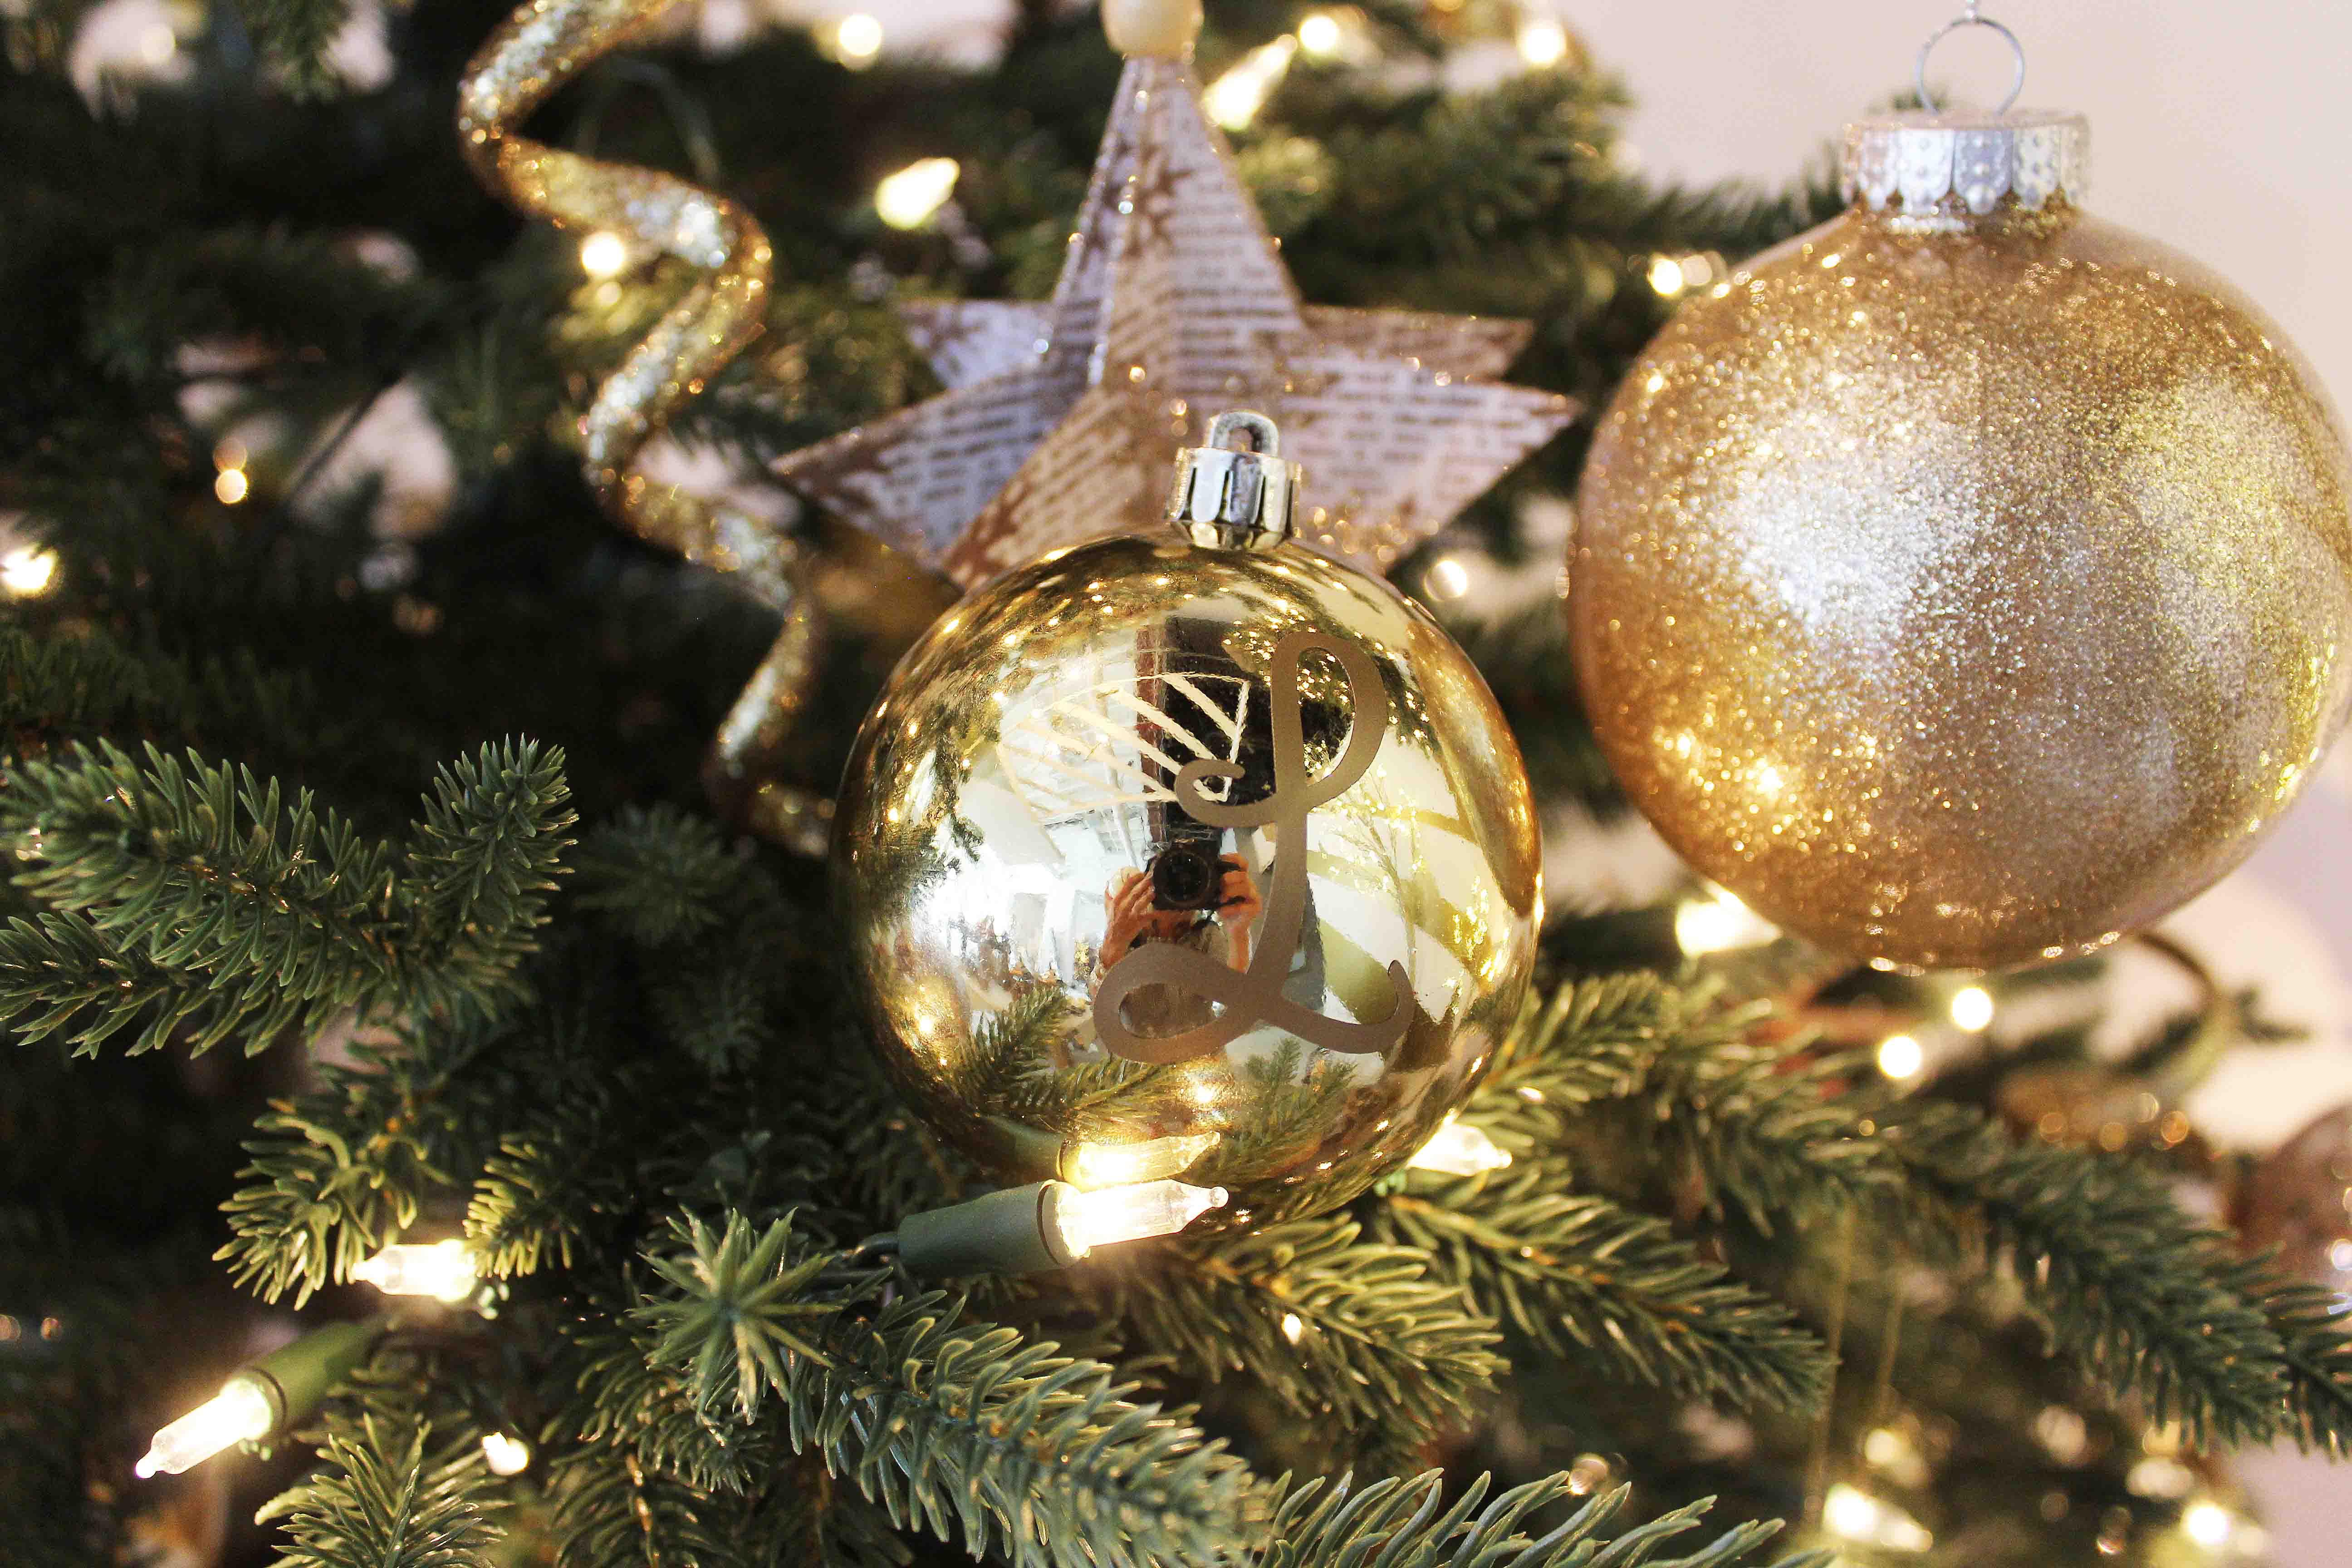 DIY Canvas Ornaments for Christmas